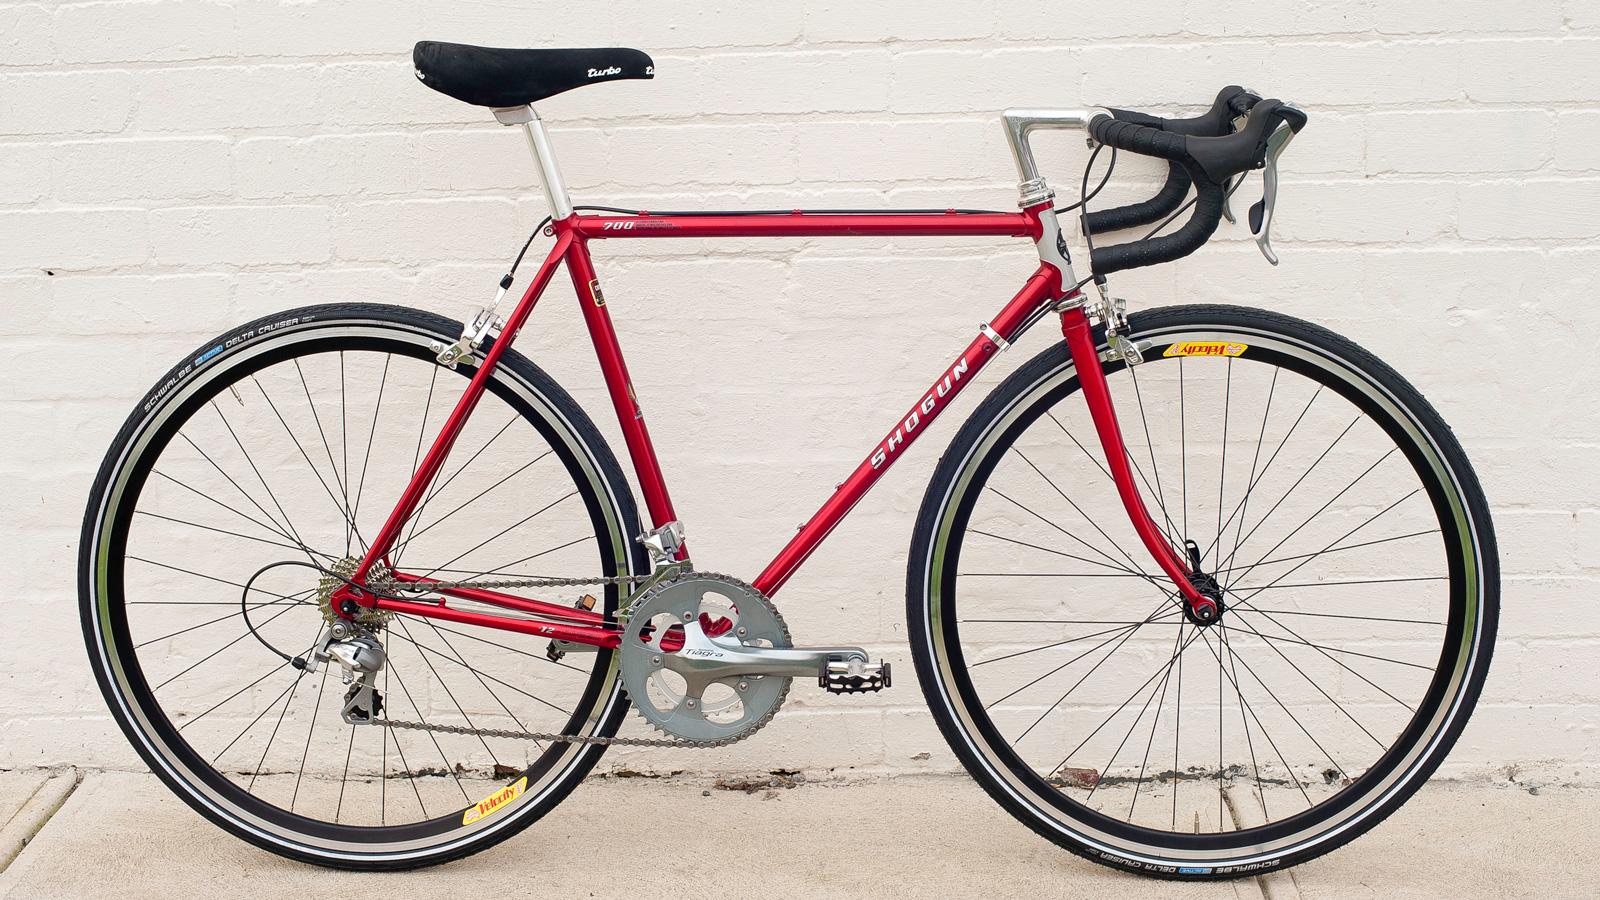 Shogun 700 with Shimano Tiagra 52cm (SOLD)   Pedal Cyclery